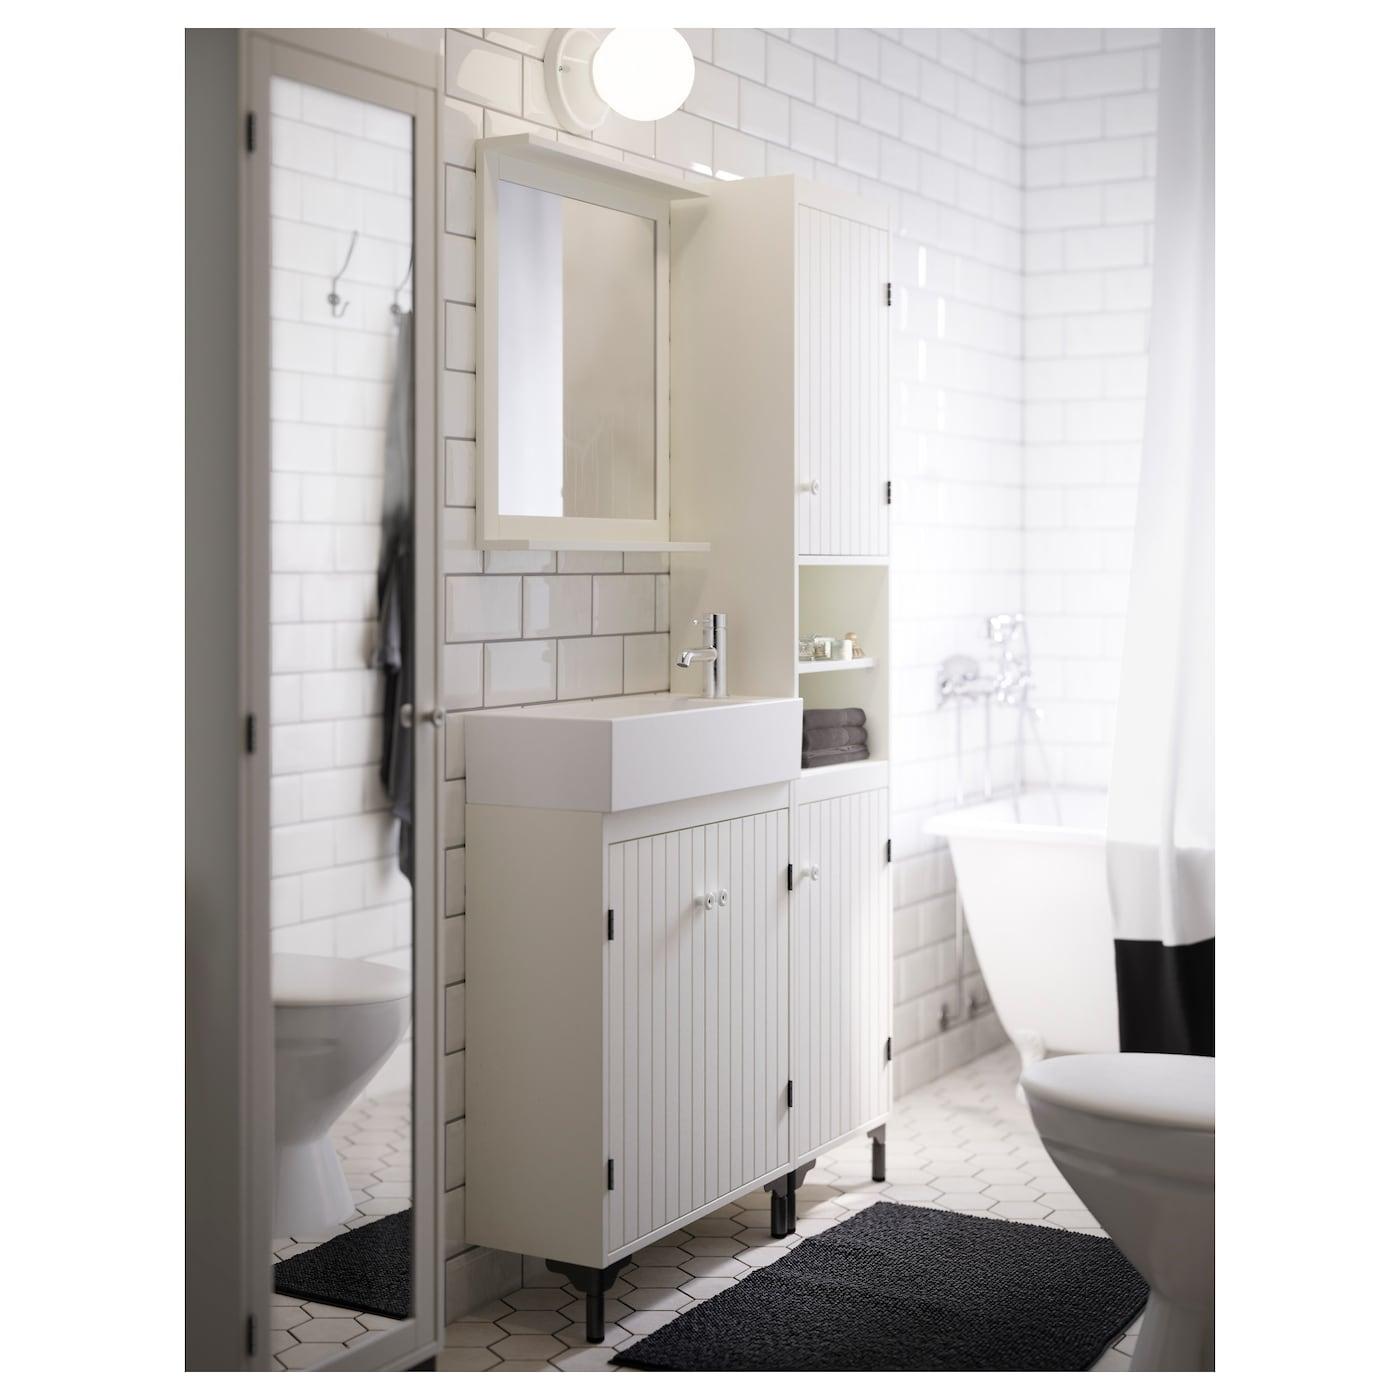 cupboard bathroom wall mirror var itm kms unit shelf westwood mount with storage cabinet